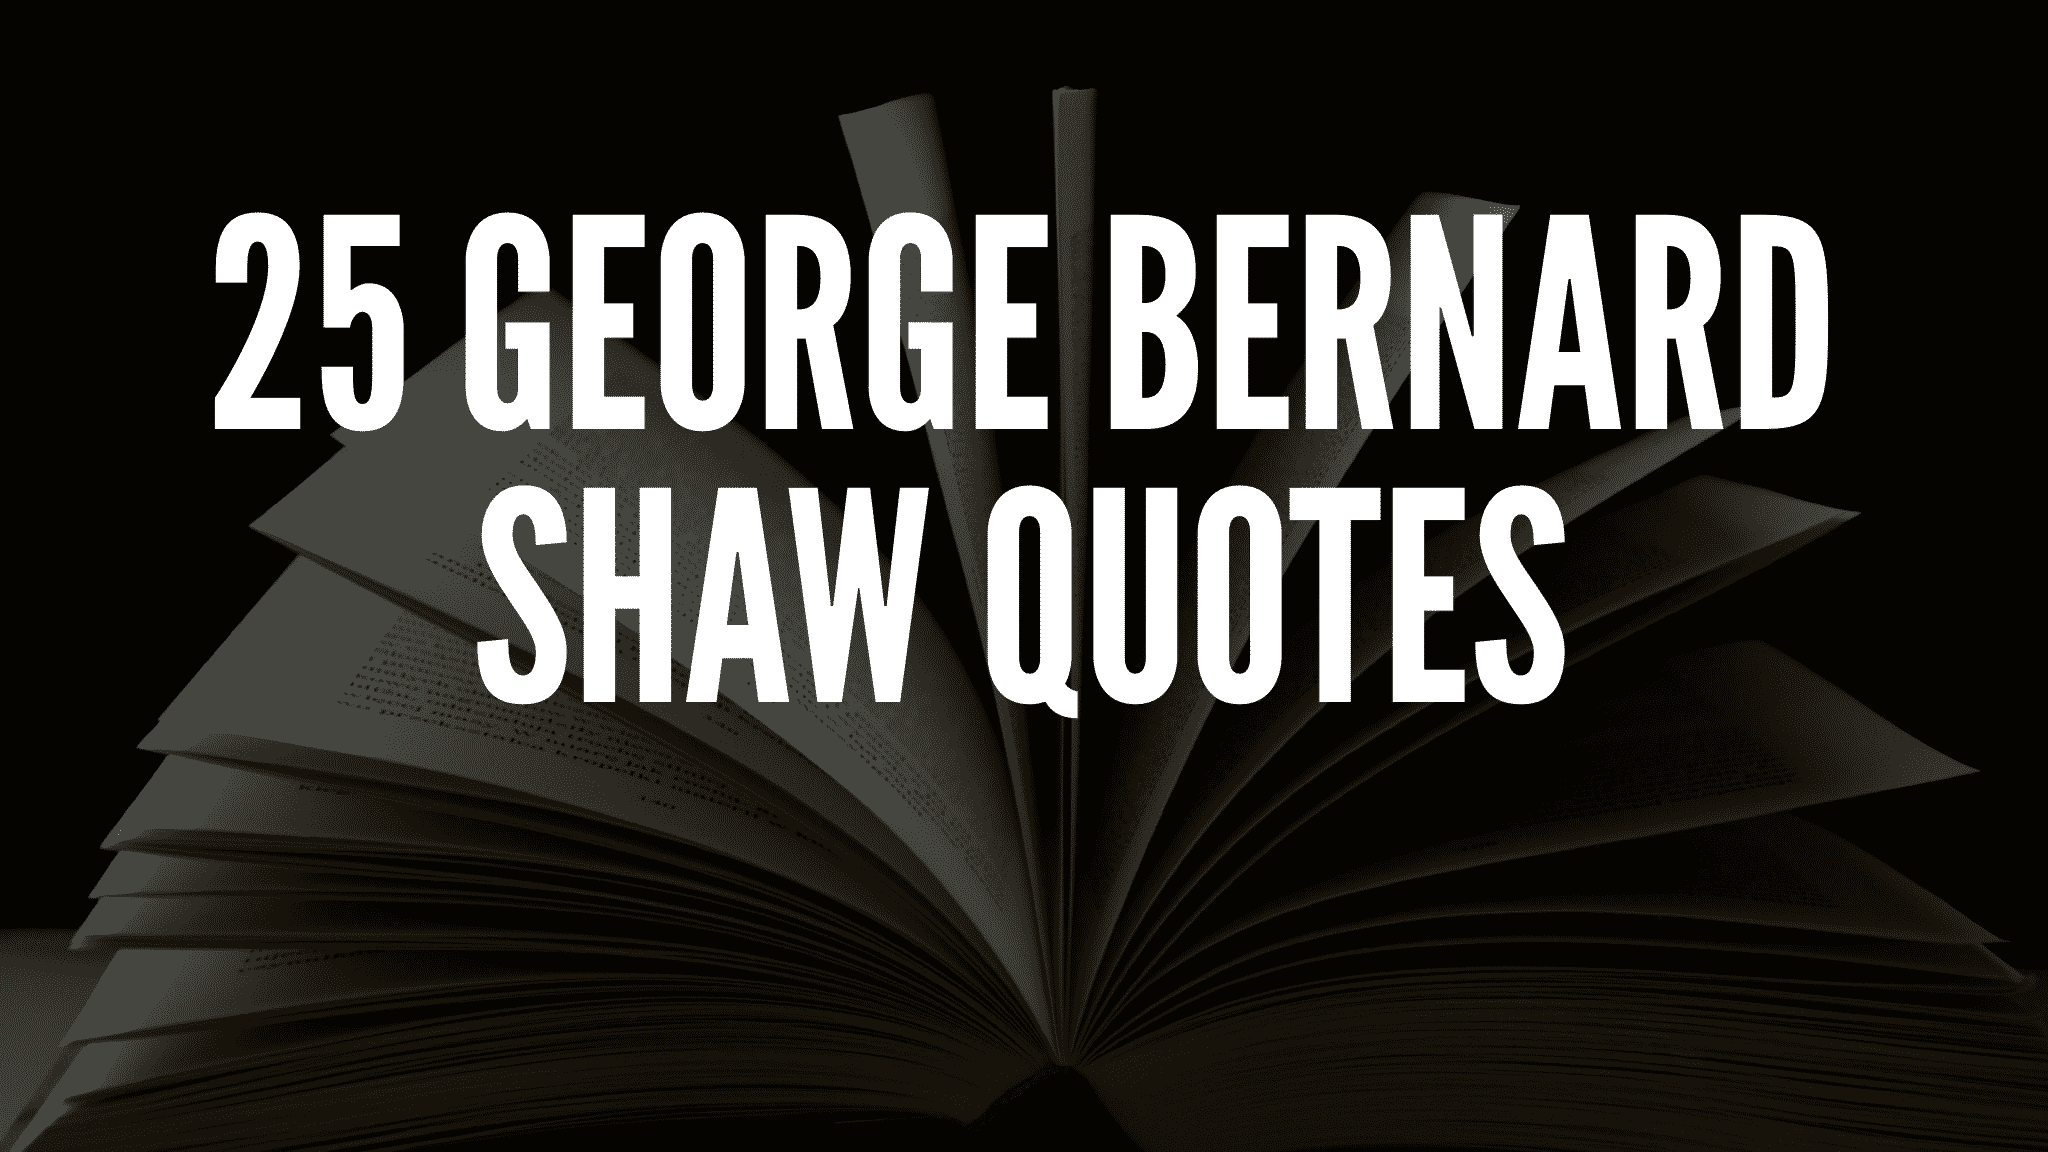 25 George Bernard Shaw Quotes